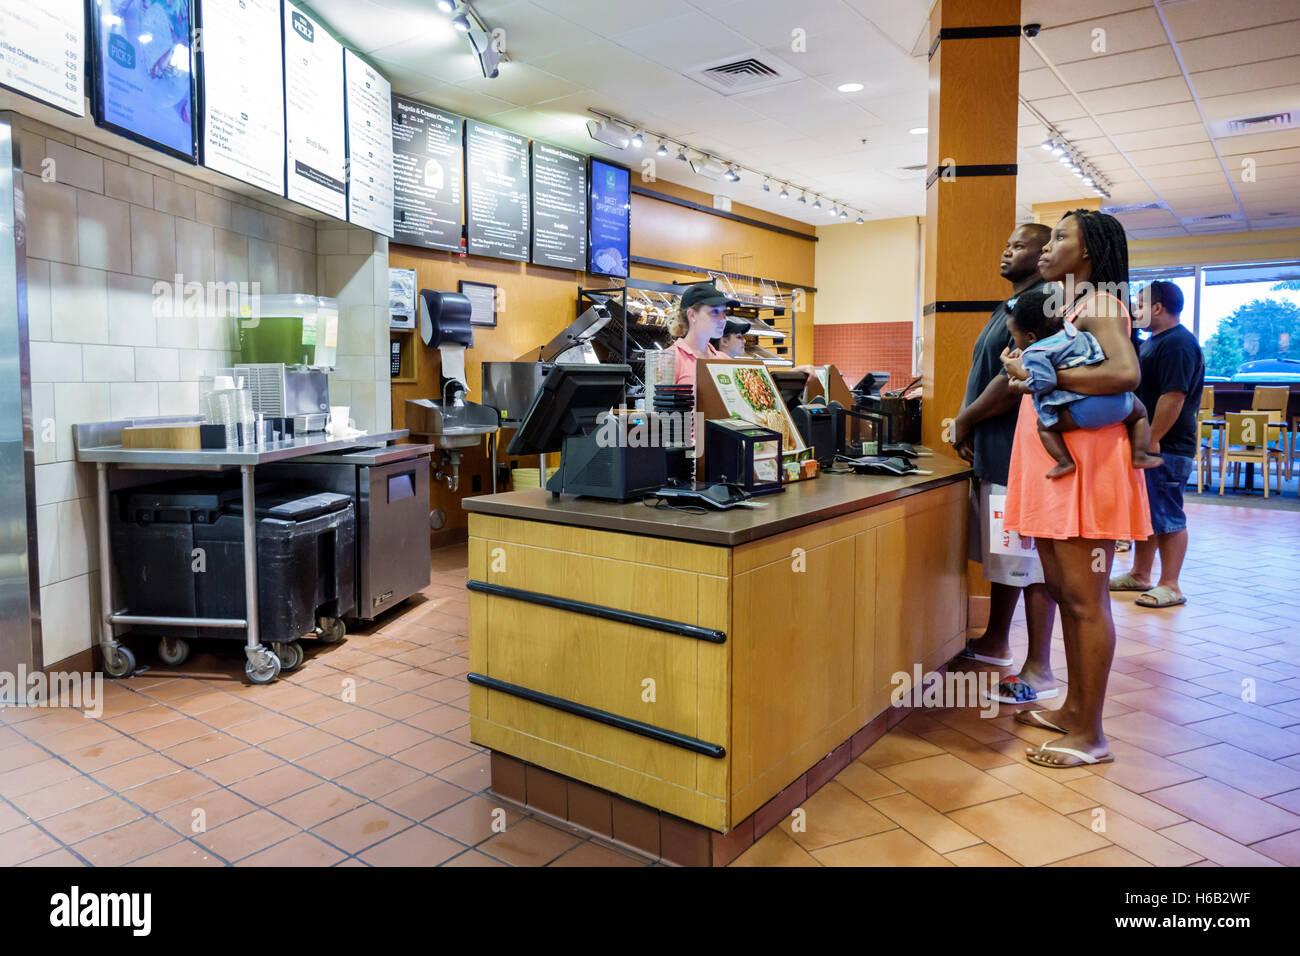 Port St. Lucie Florida Saint Panera Bread inside restaurant counter Black woman man baby family ordering - Stock Image